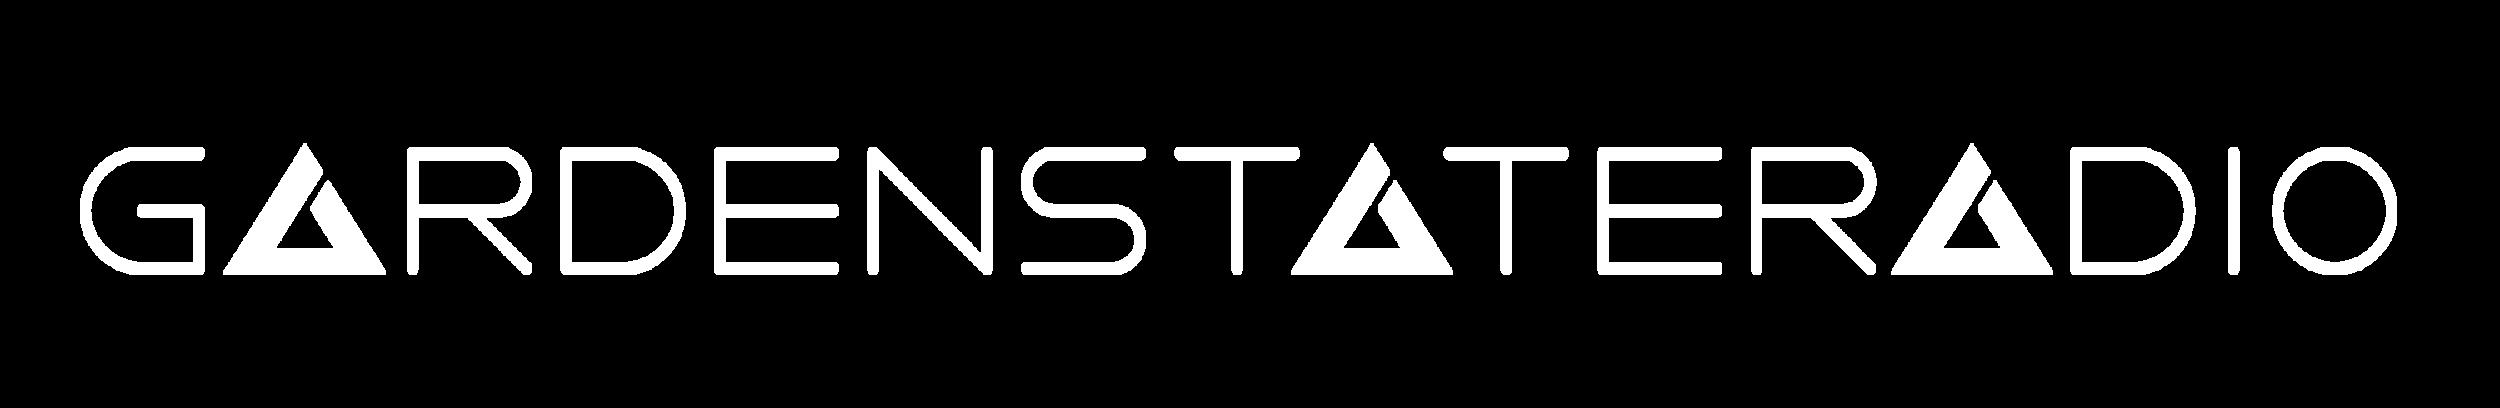 GSR-Logo-horizontal_white-only-2018.png